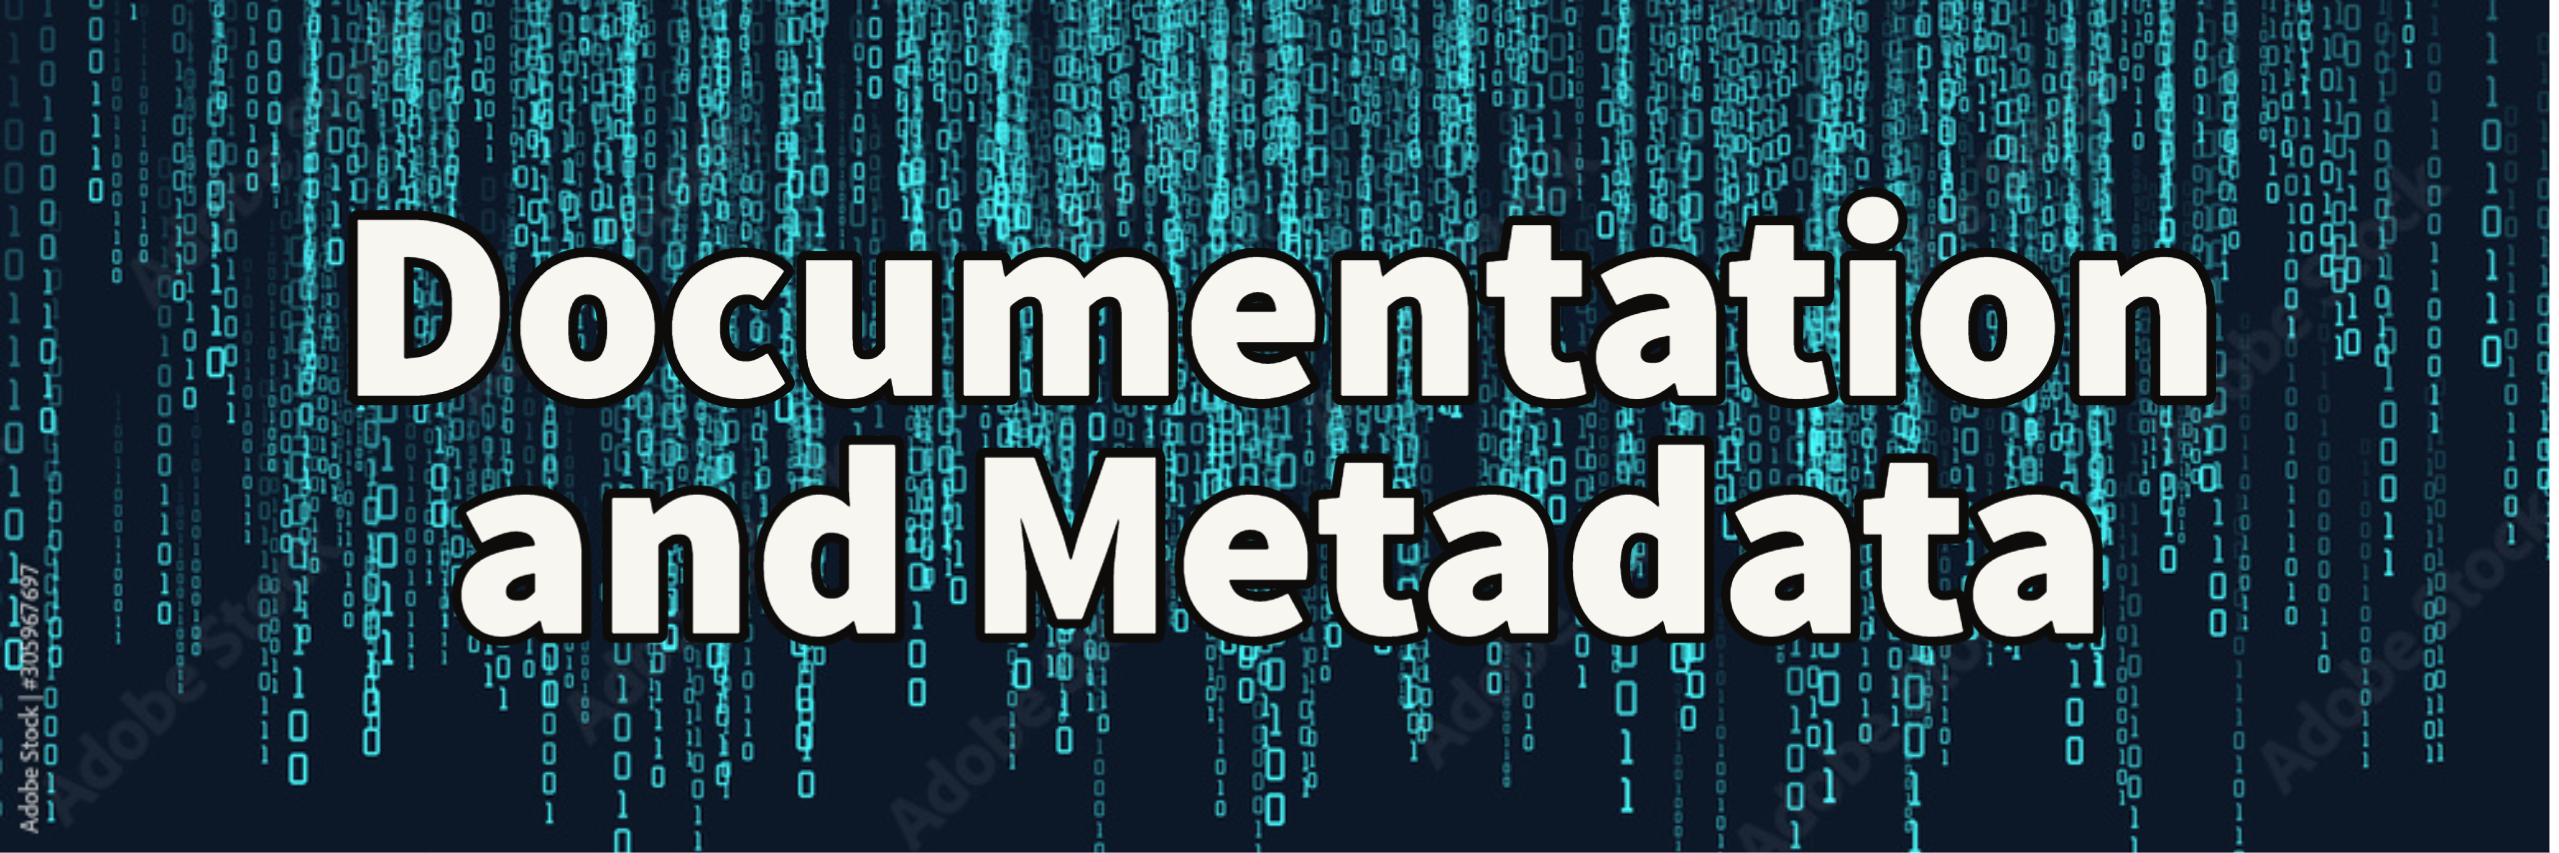 documentation and metadata